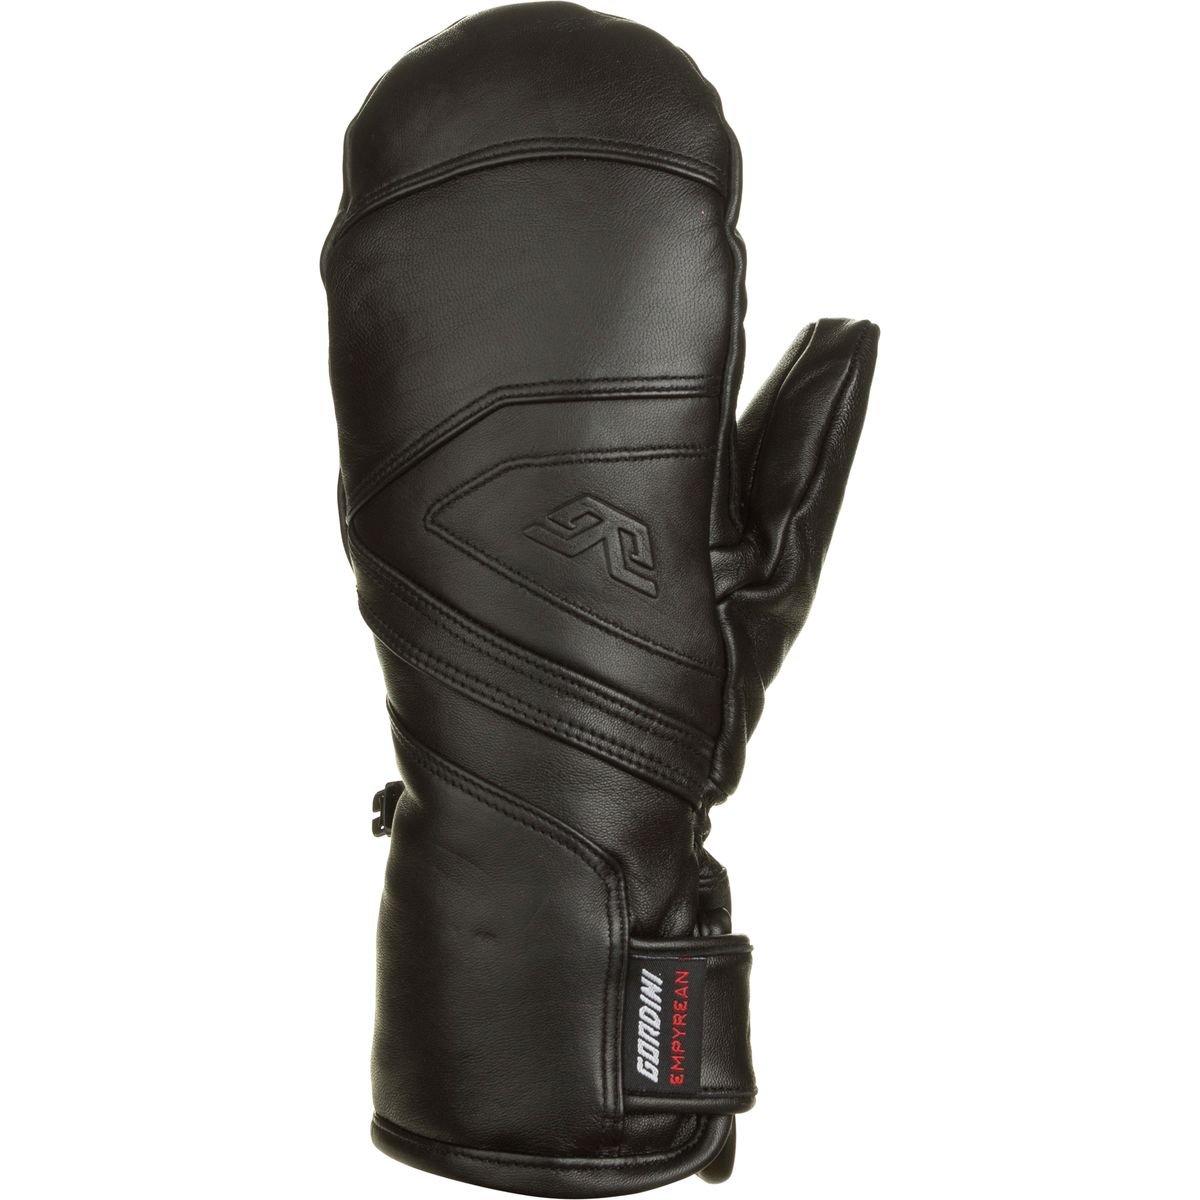 Gordini Womens 3M4141 Downtec Leather Mitten, Black - M by Gordini